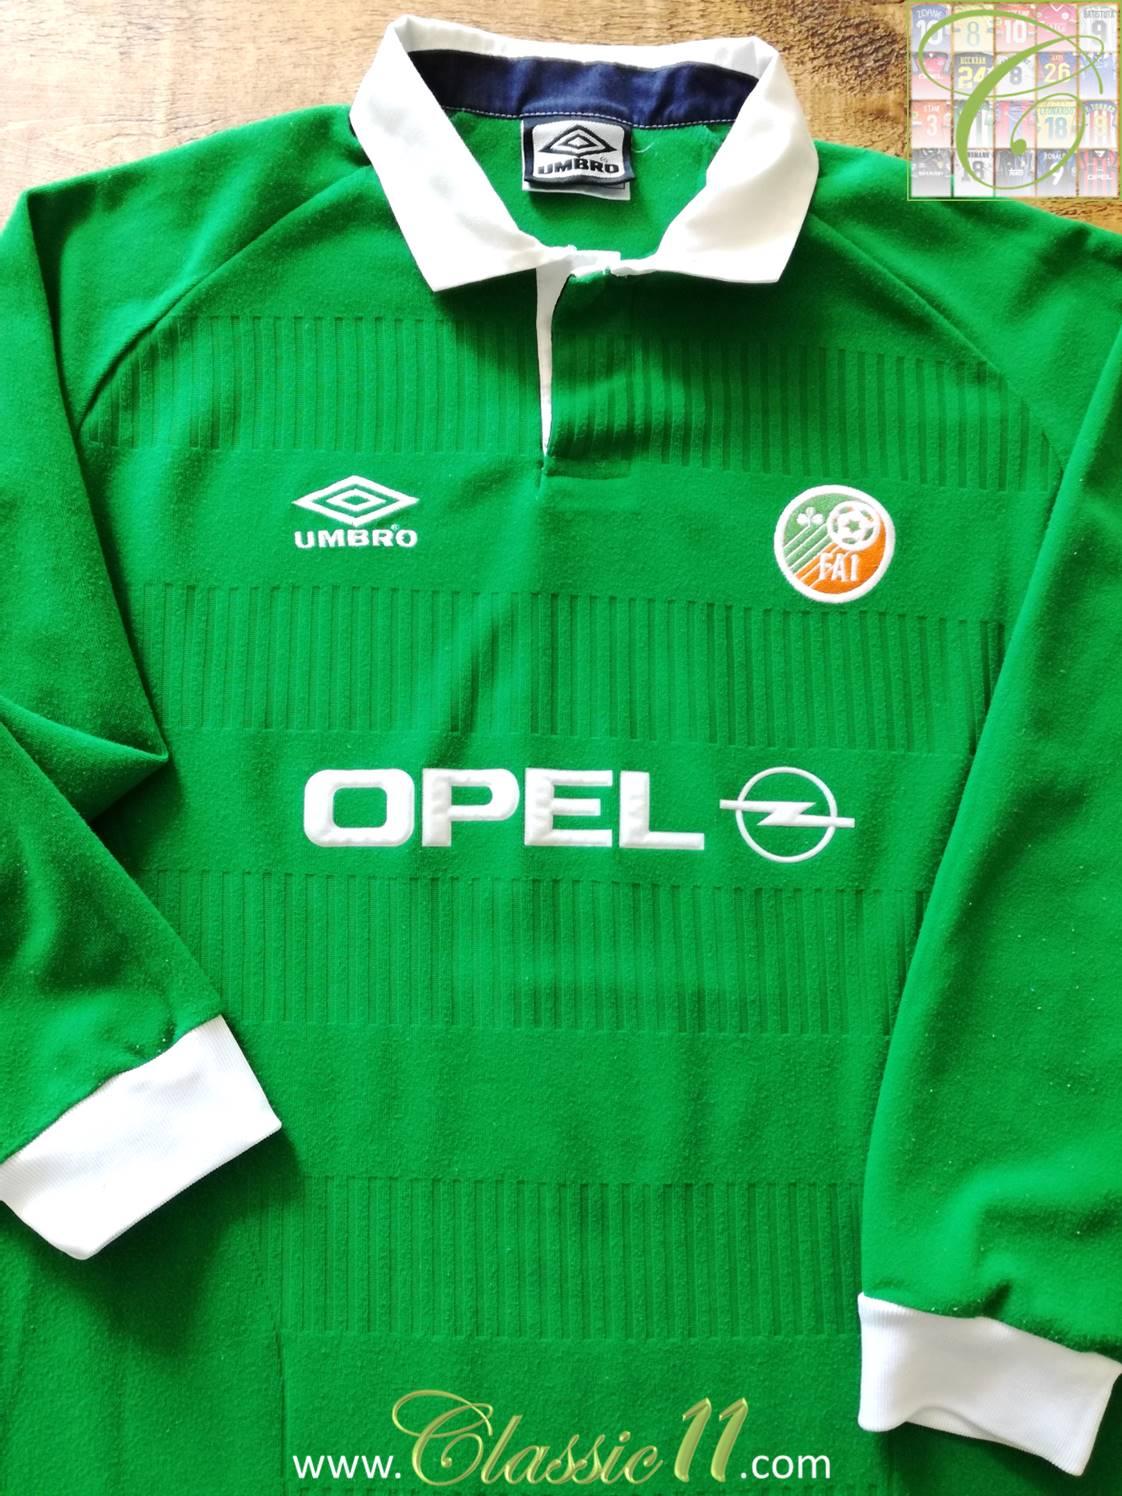 Republic of Ireland Home fotbollströja 2000 - 2001. a1060fe52